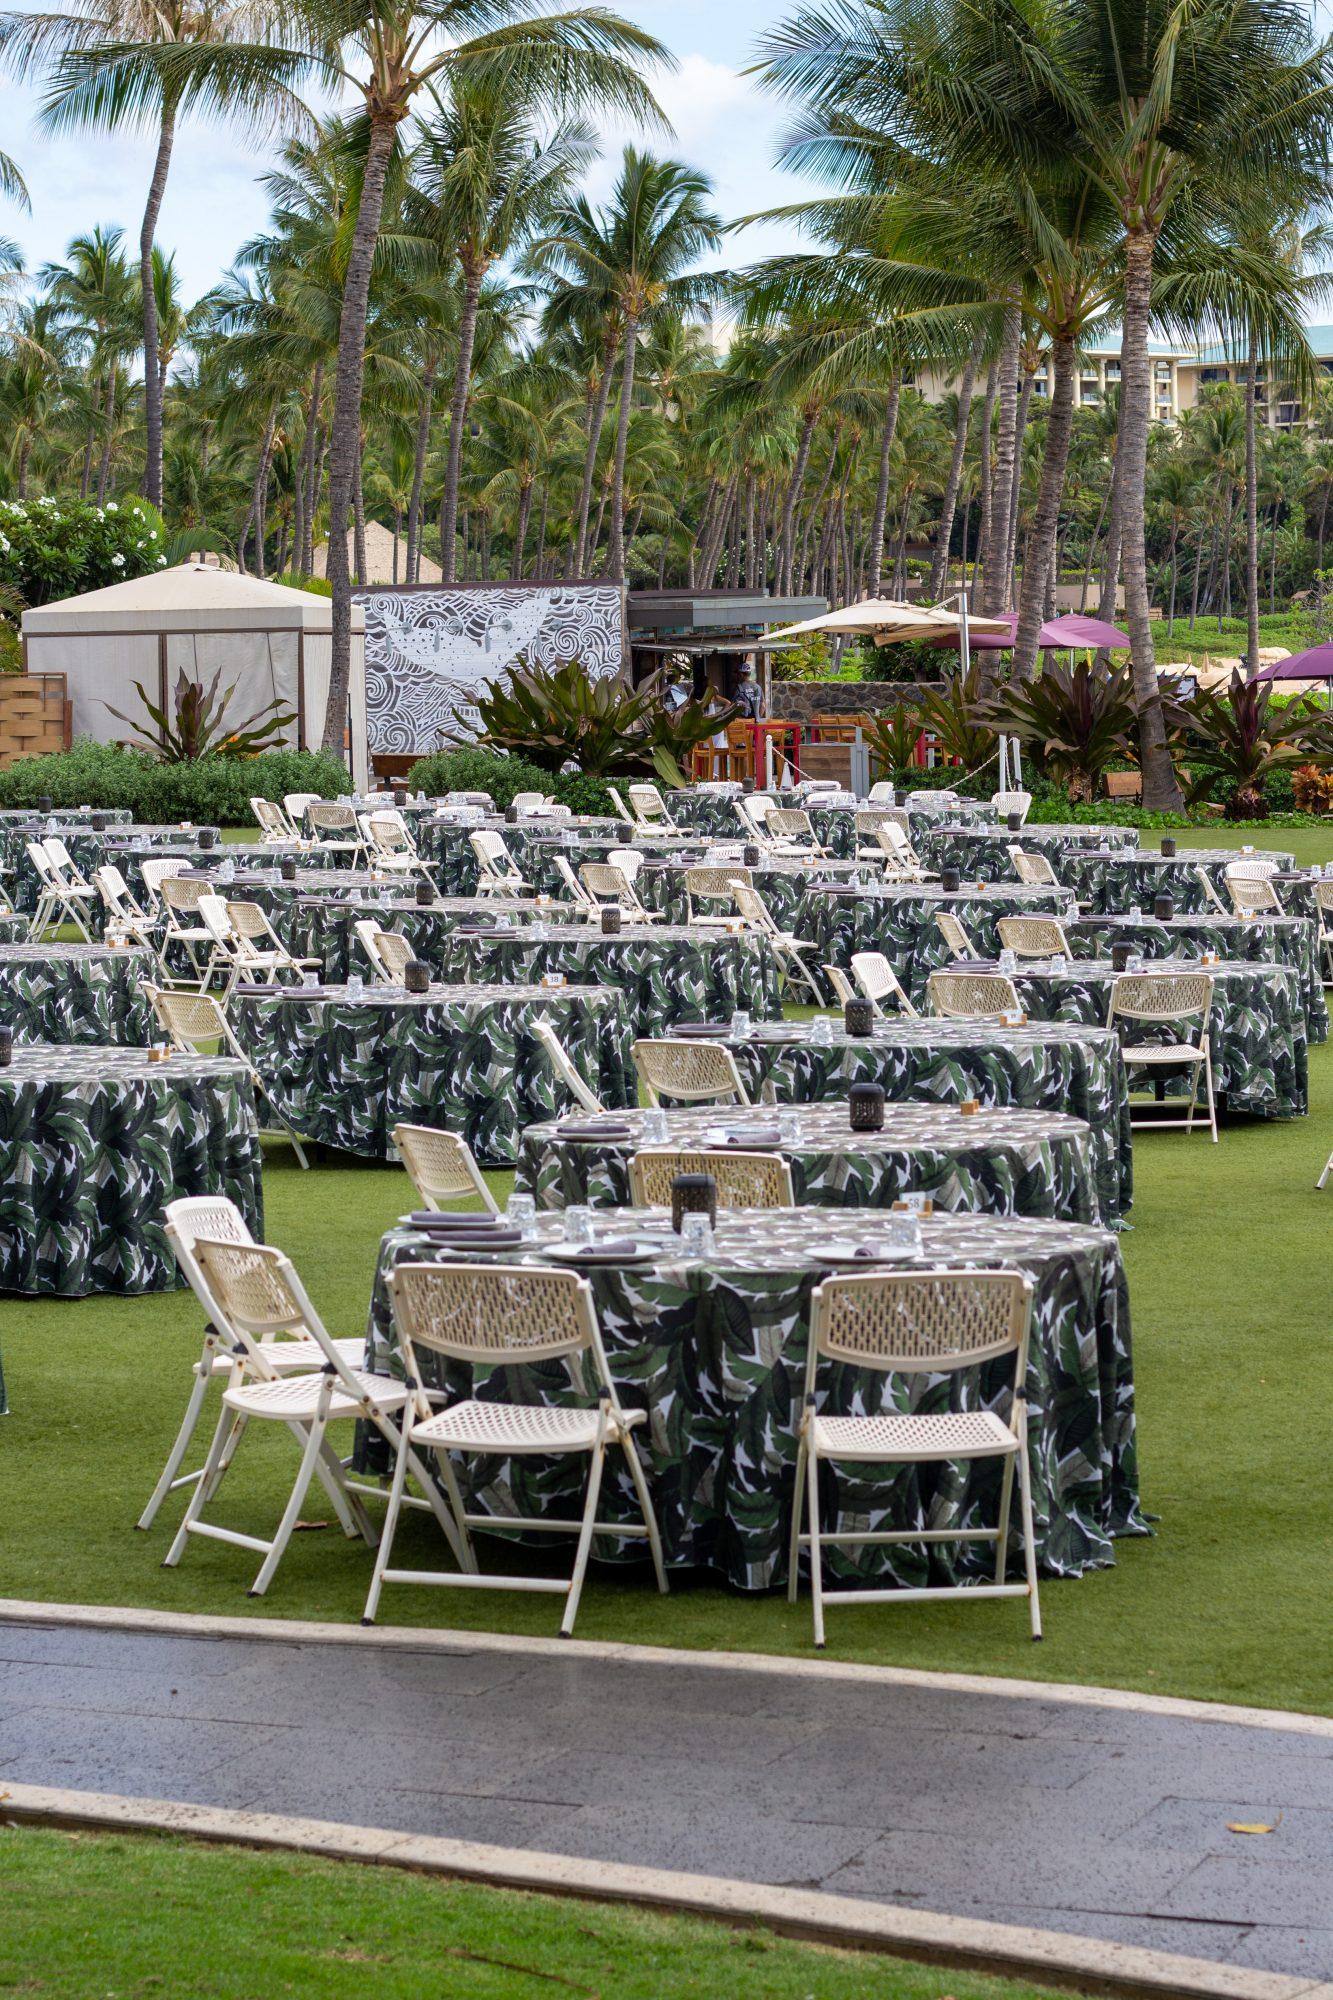 setting up for a luau in Wailea